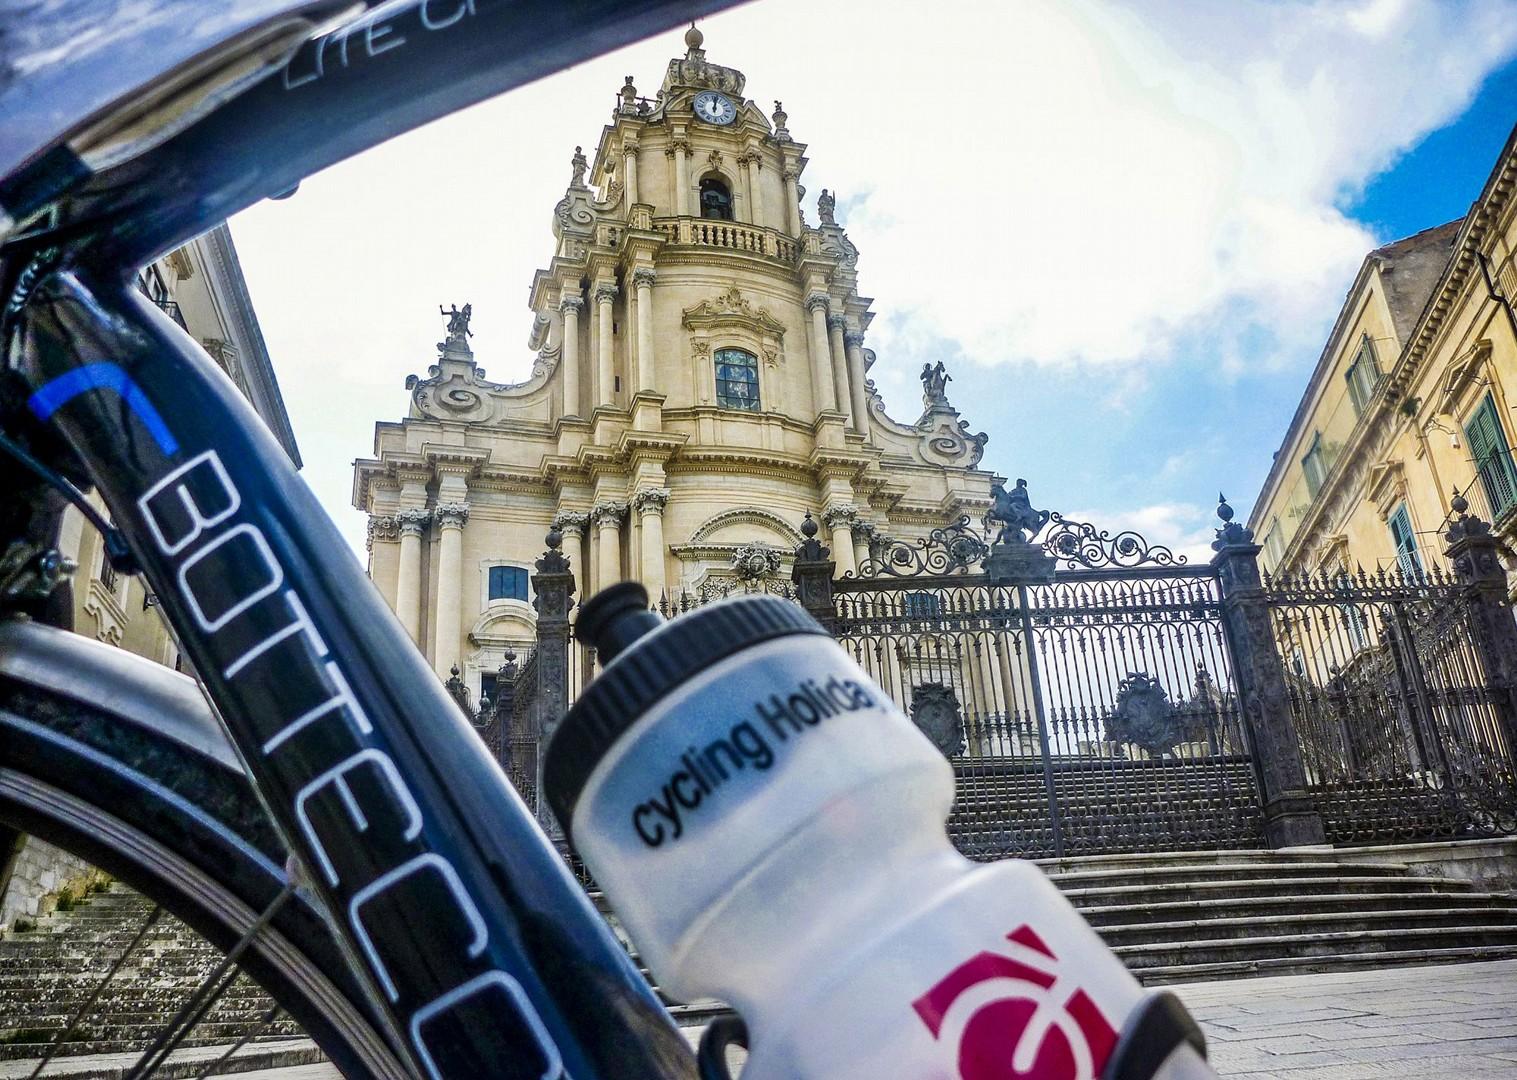 sicily-italy-cycling-ortiga-di-siracusa-holiday-tour-skedaddle.jpg - Italy - Sicily - Self-Guided Leisure Cycling Holiday - Italia Leisure and Family Cycling